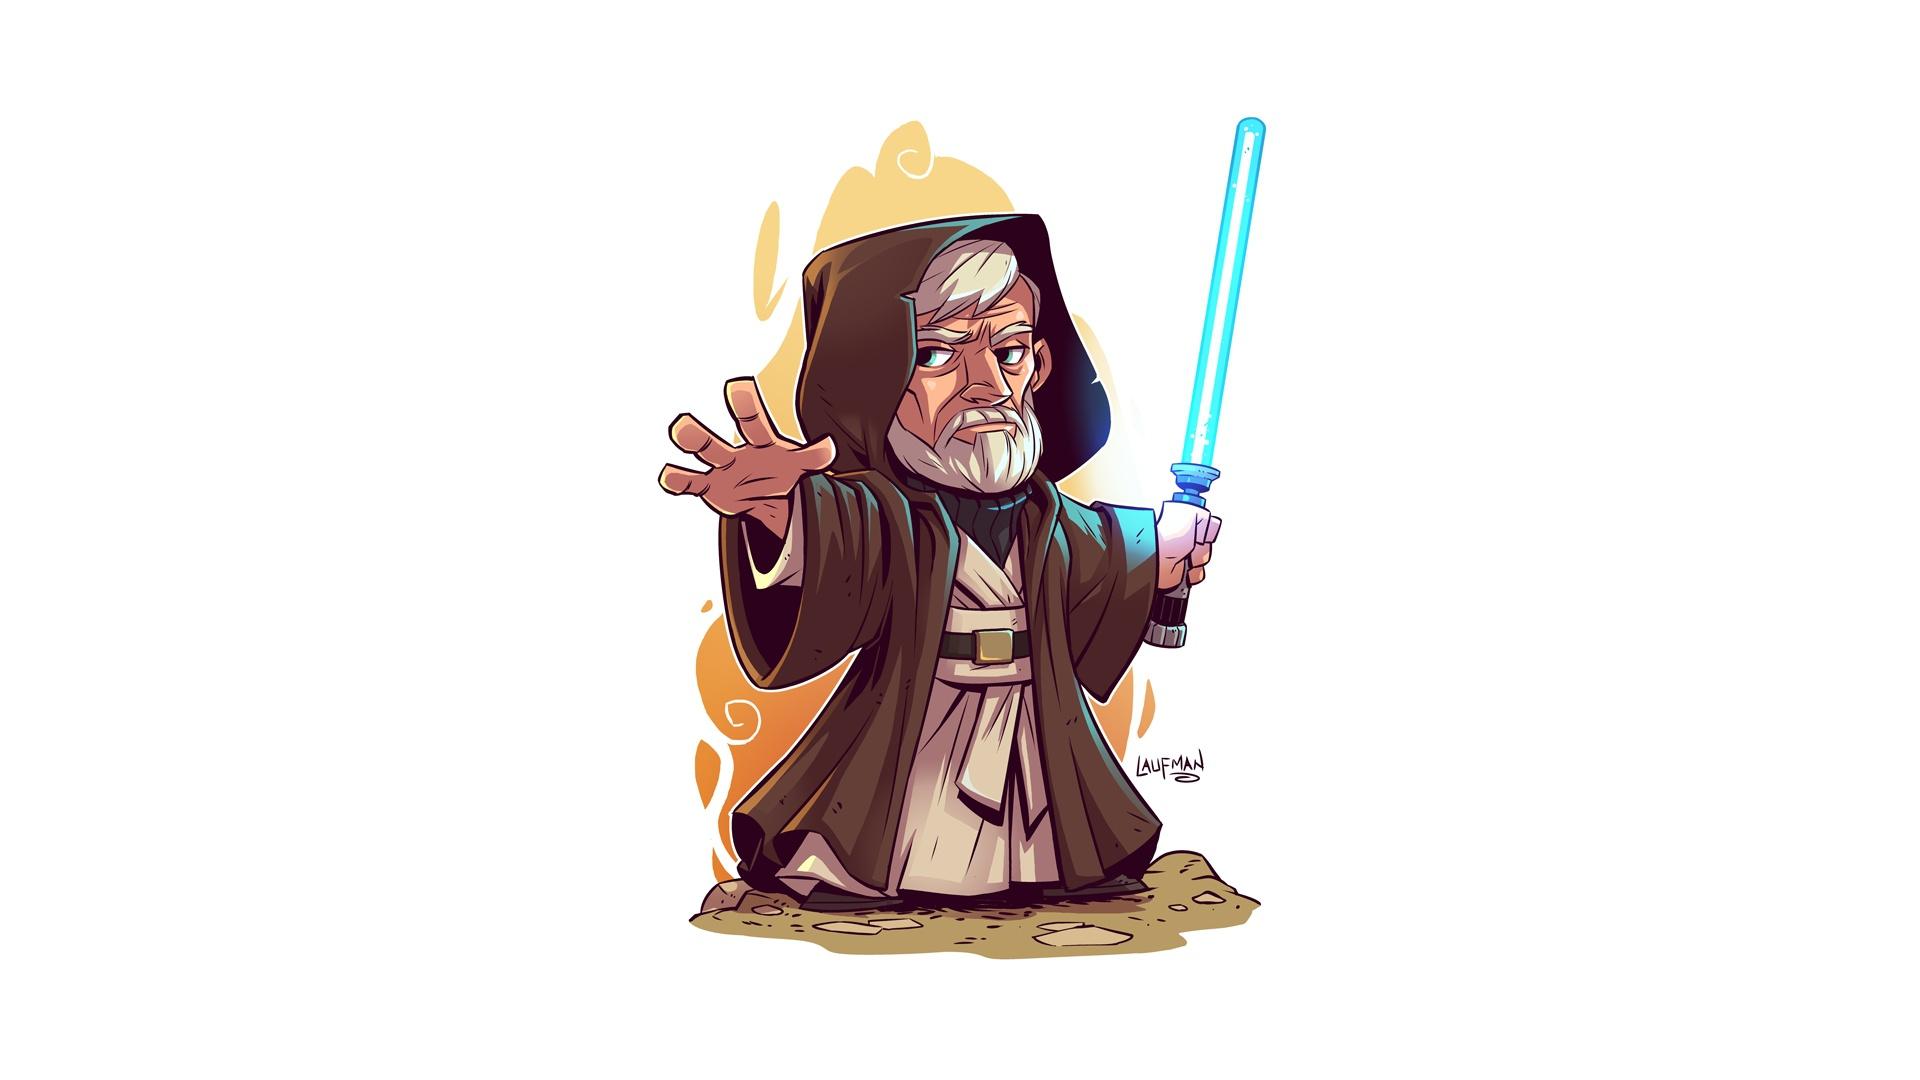 Wallpaper Obi Wan Kenobi Star Wars Artwork Simple Background